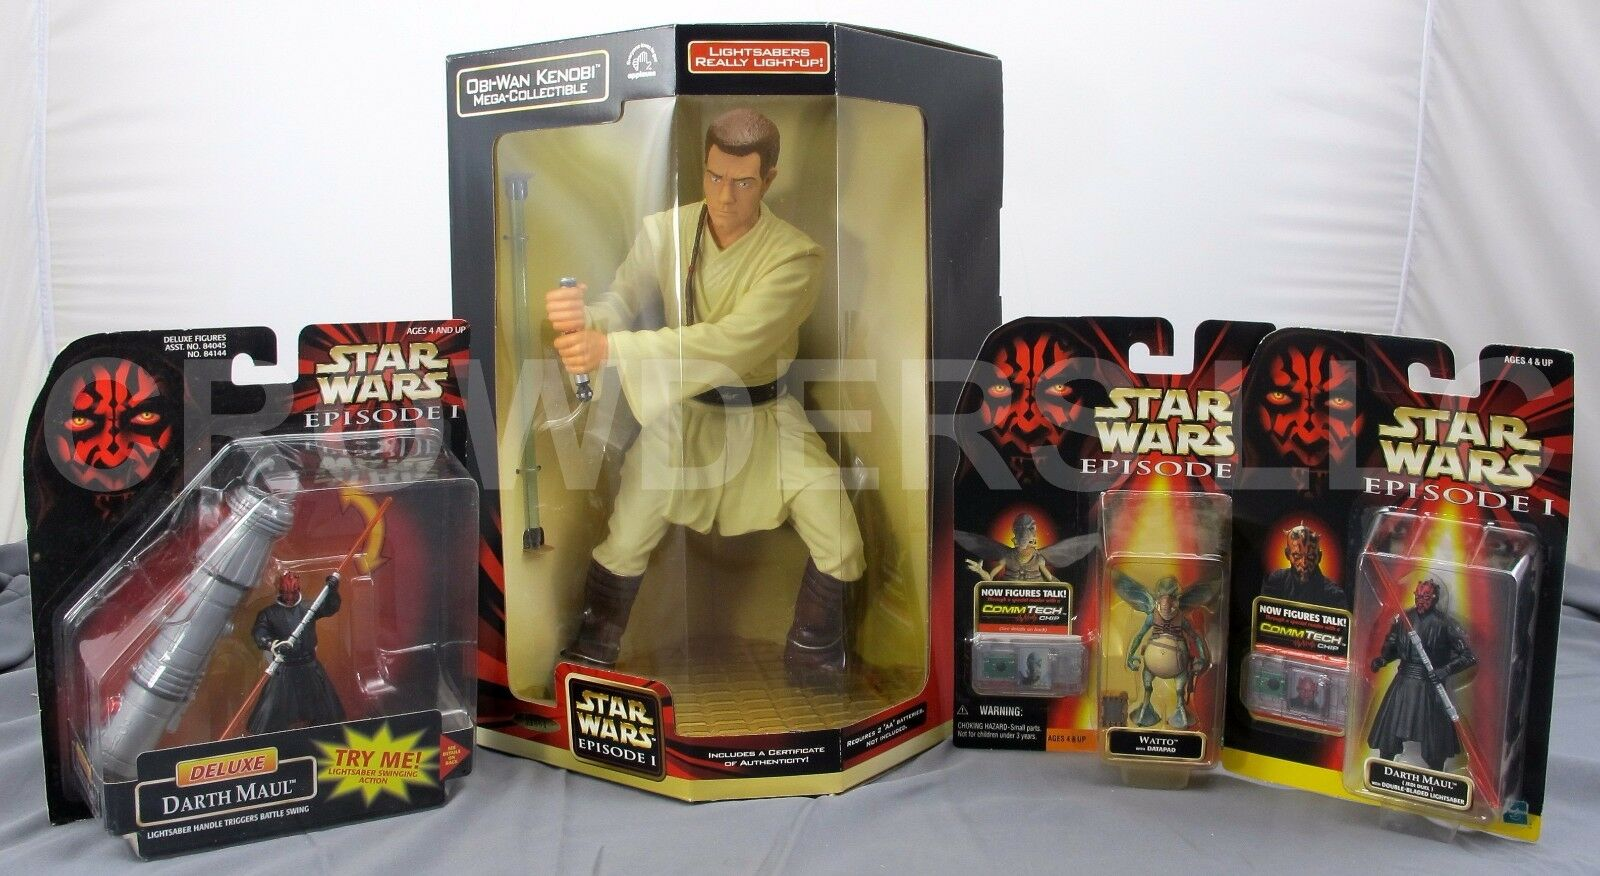 Star wars, obi - wan kenobi mega - sammelfigur darth maul deluxe & jedi - duell + watto